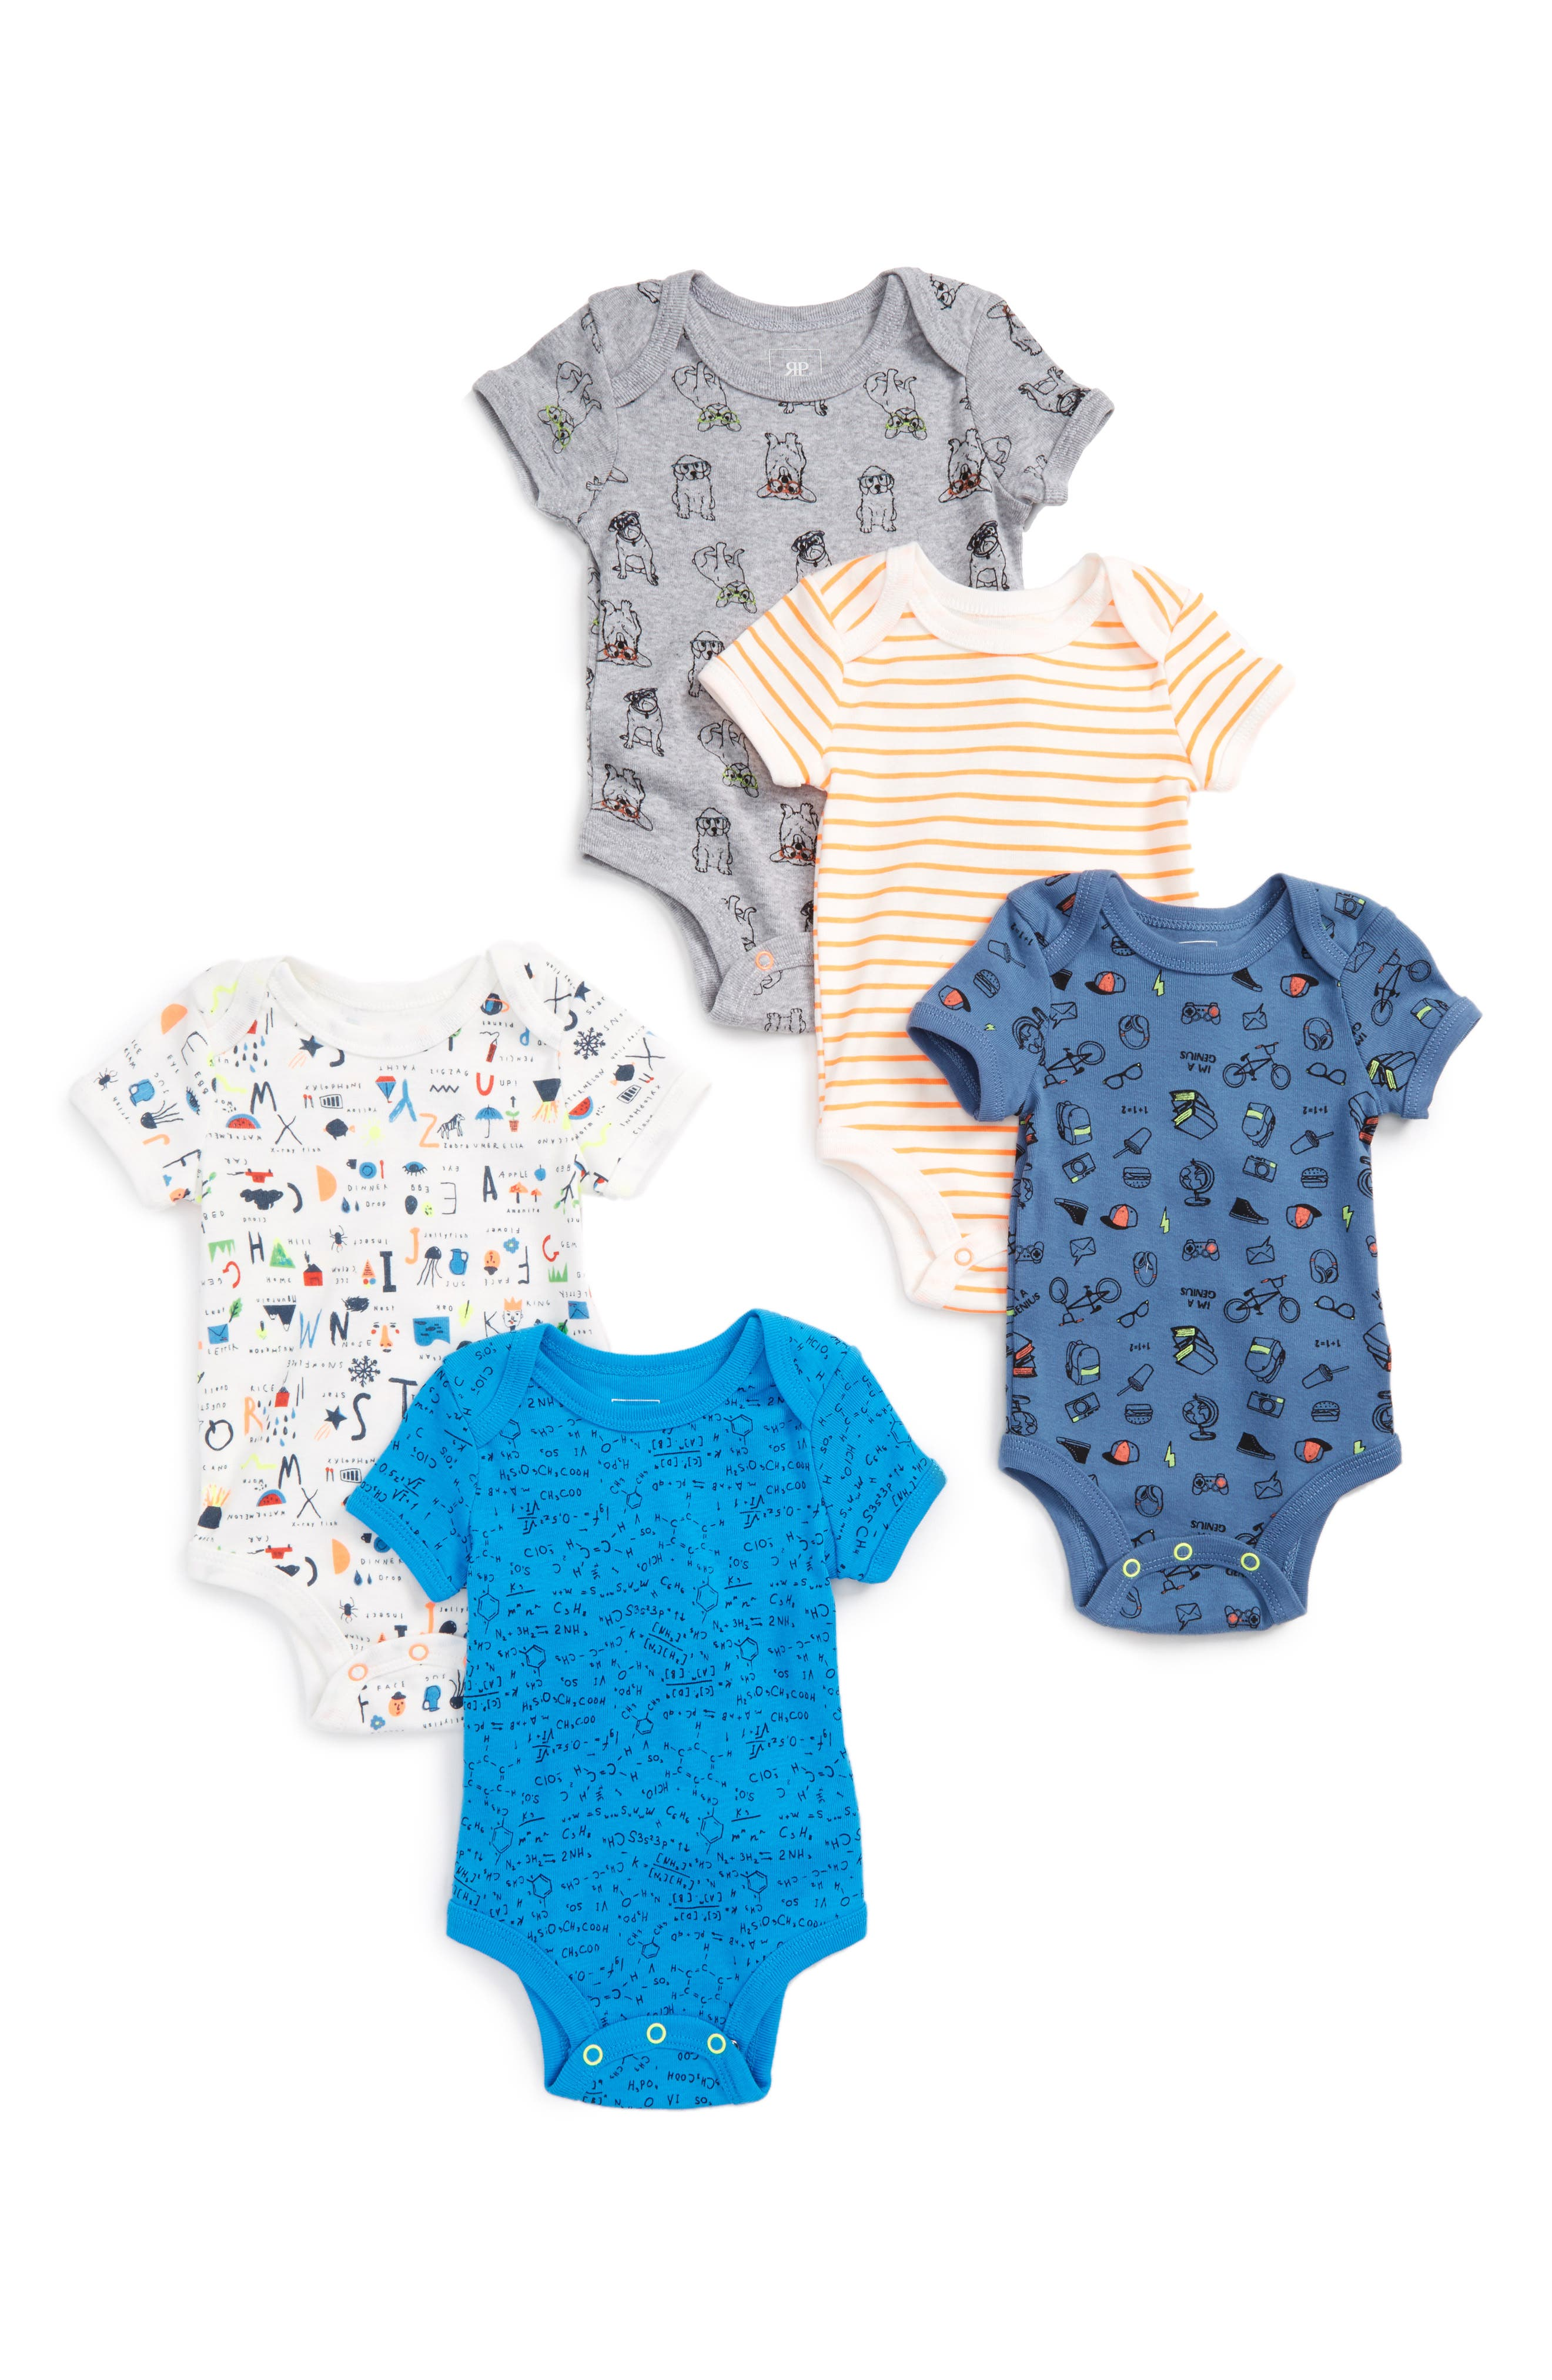 Rosie Pope Nerd Alert 5-Pack Bodysuits (Baby Boys)